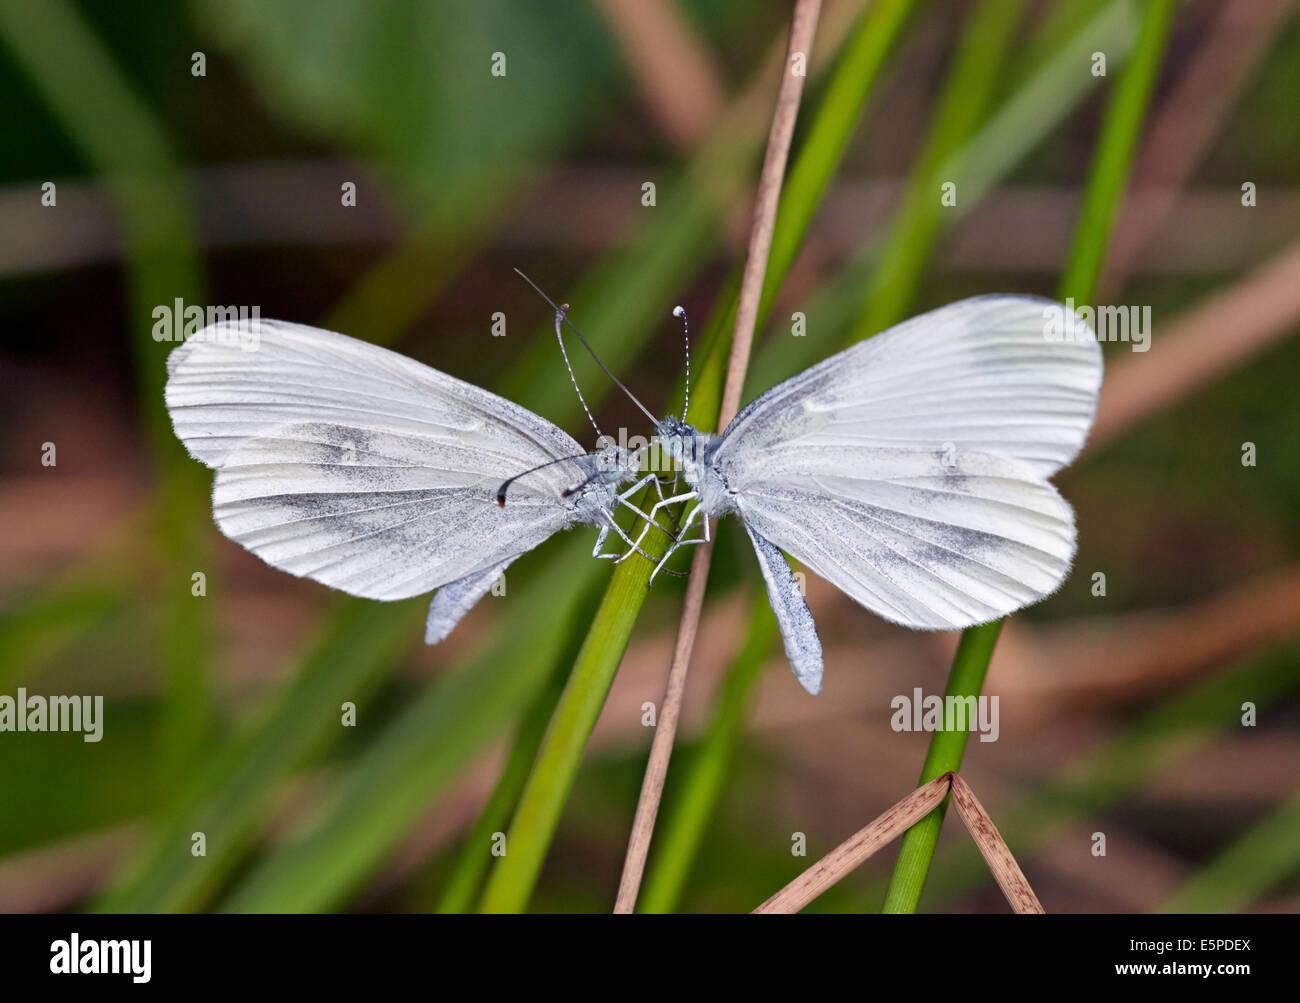 Courtship ritual of Wood White butterflies. Oaken Wood, Chiddingfold, Surrey, England. - Stock Image